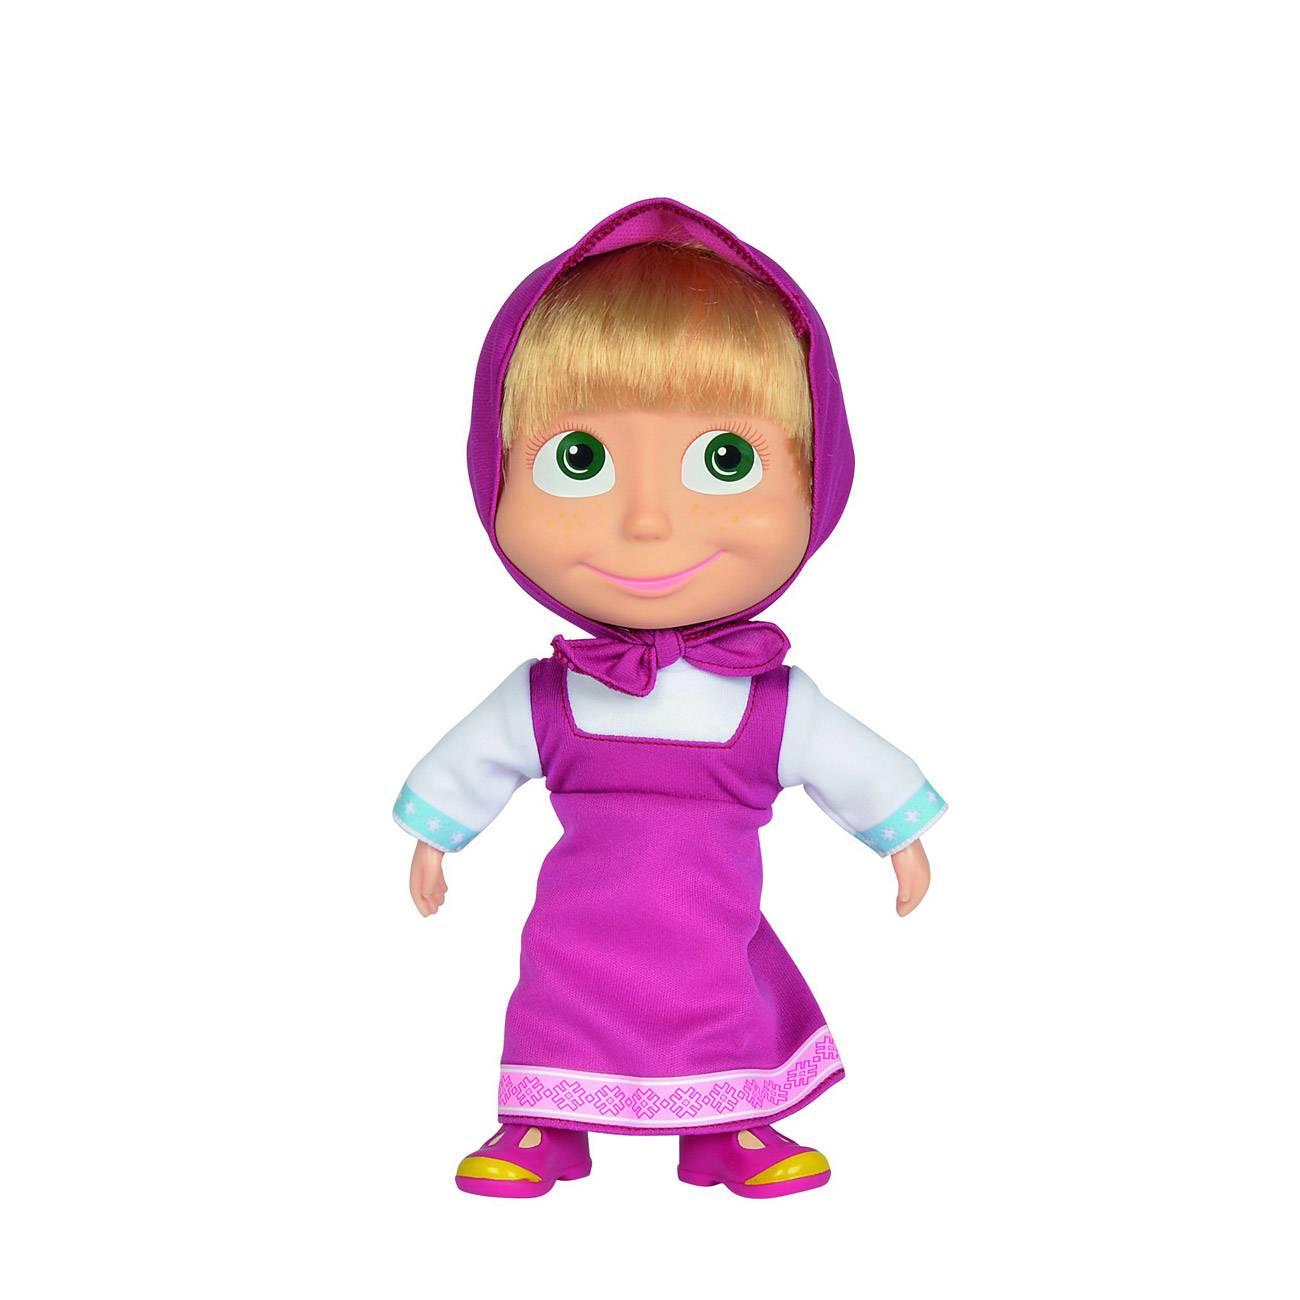 Masha Doll Pink Dress